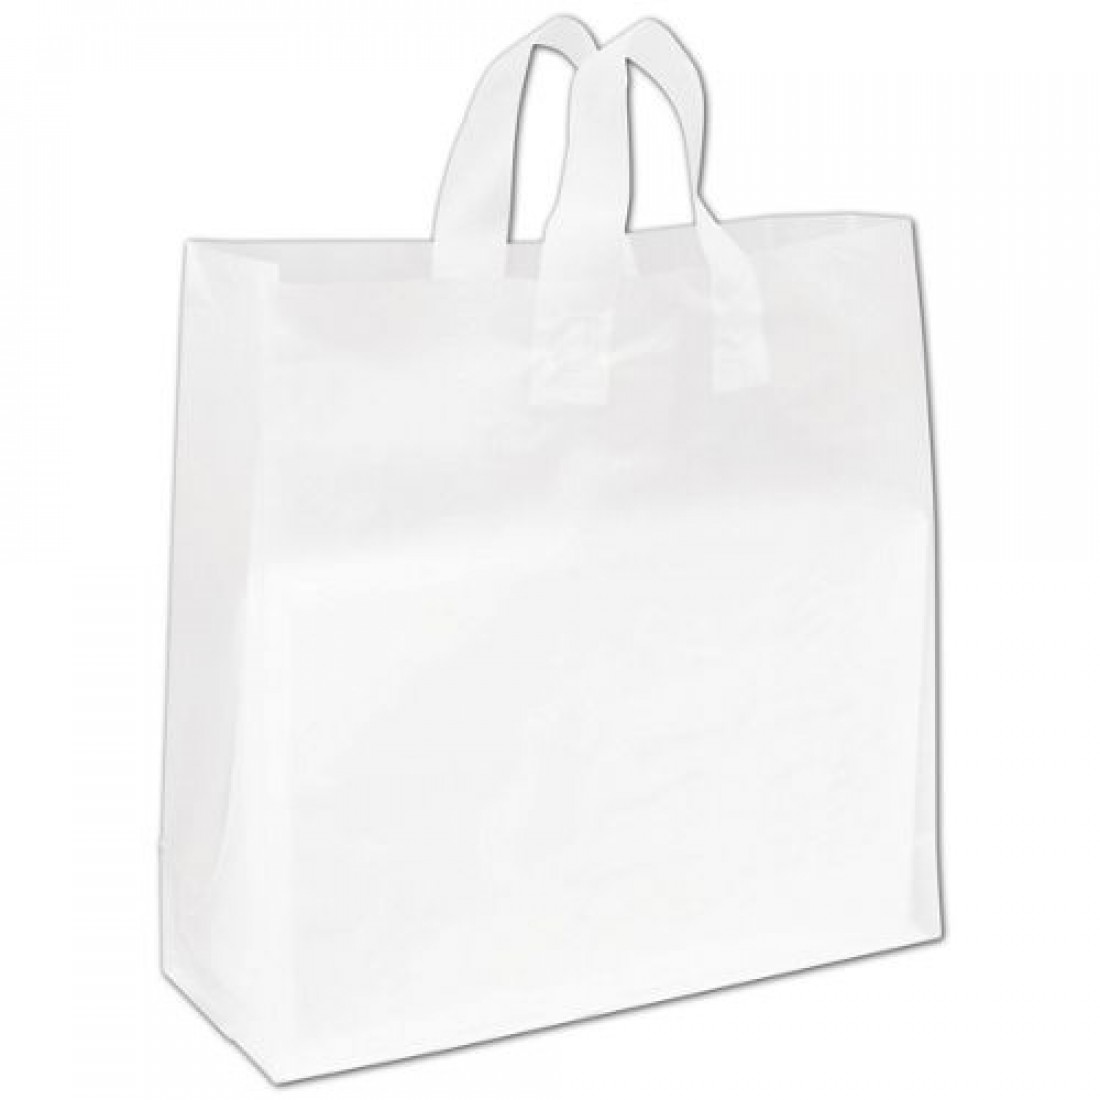 Clear Frst HiDen Bag 16x6x16